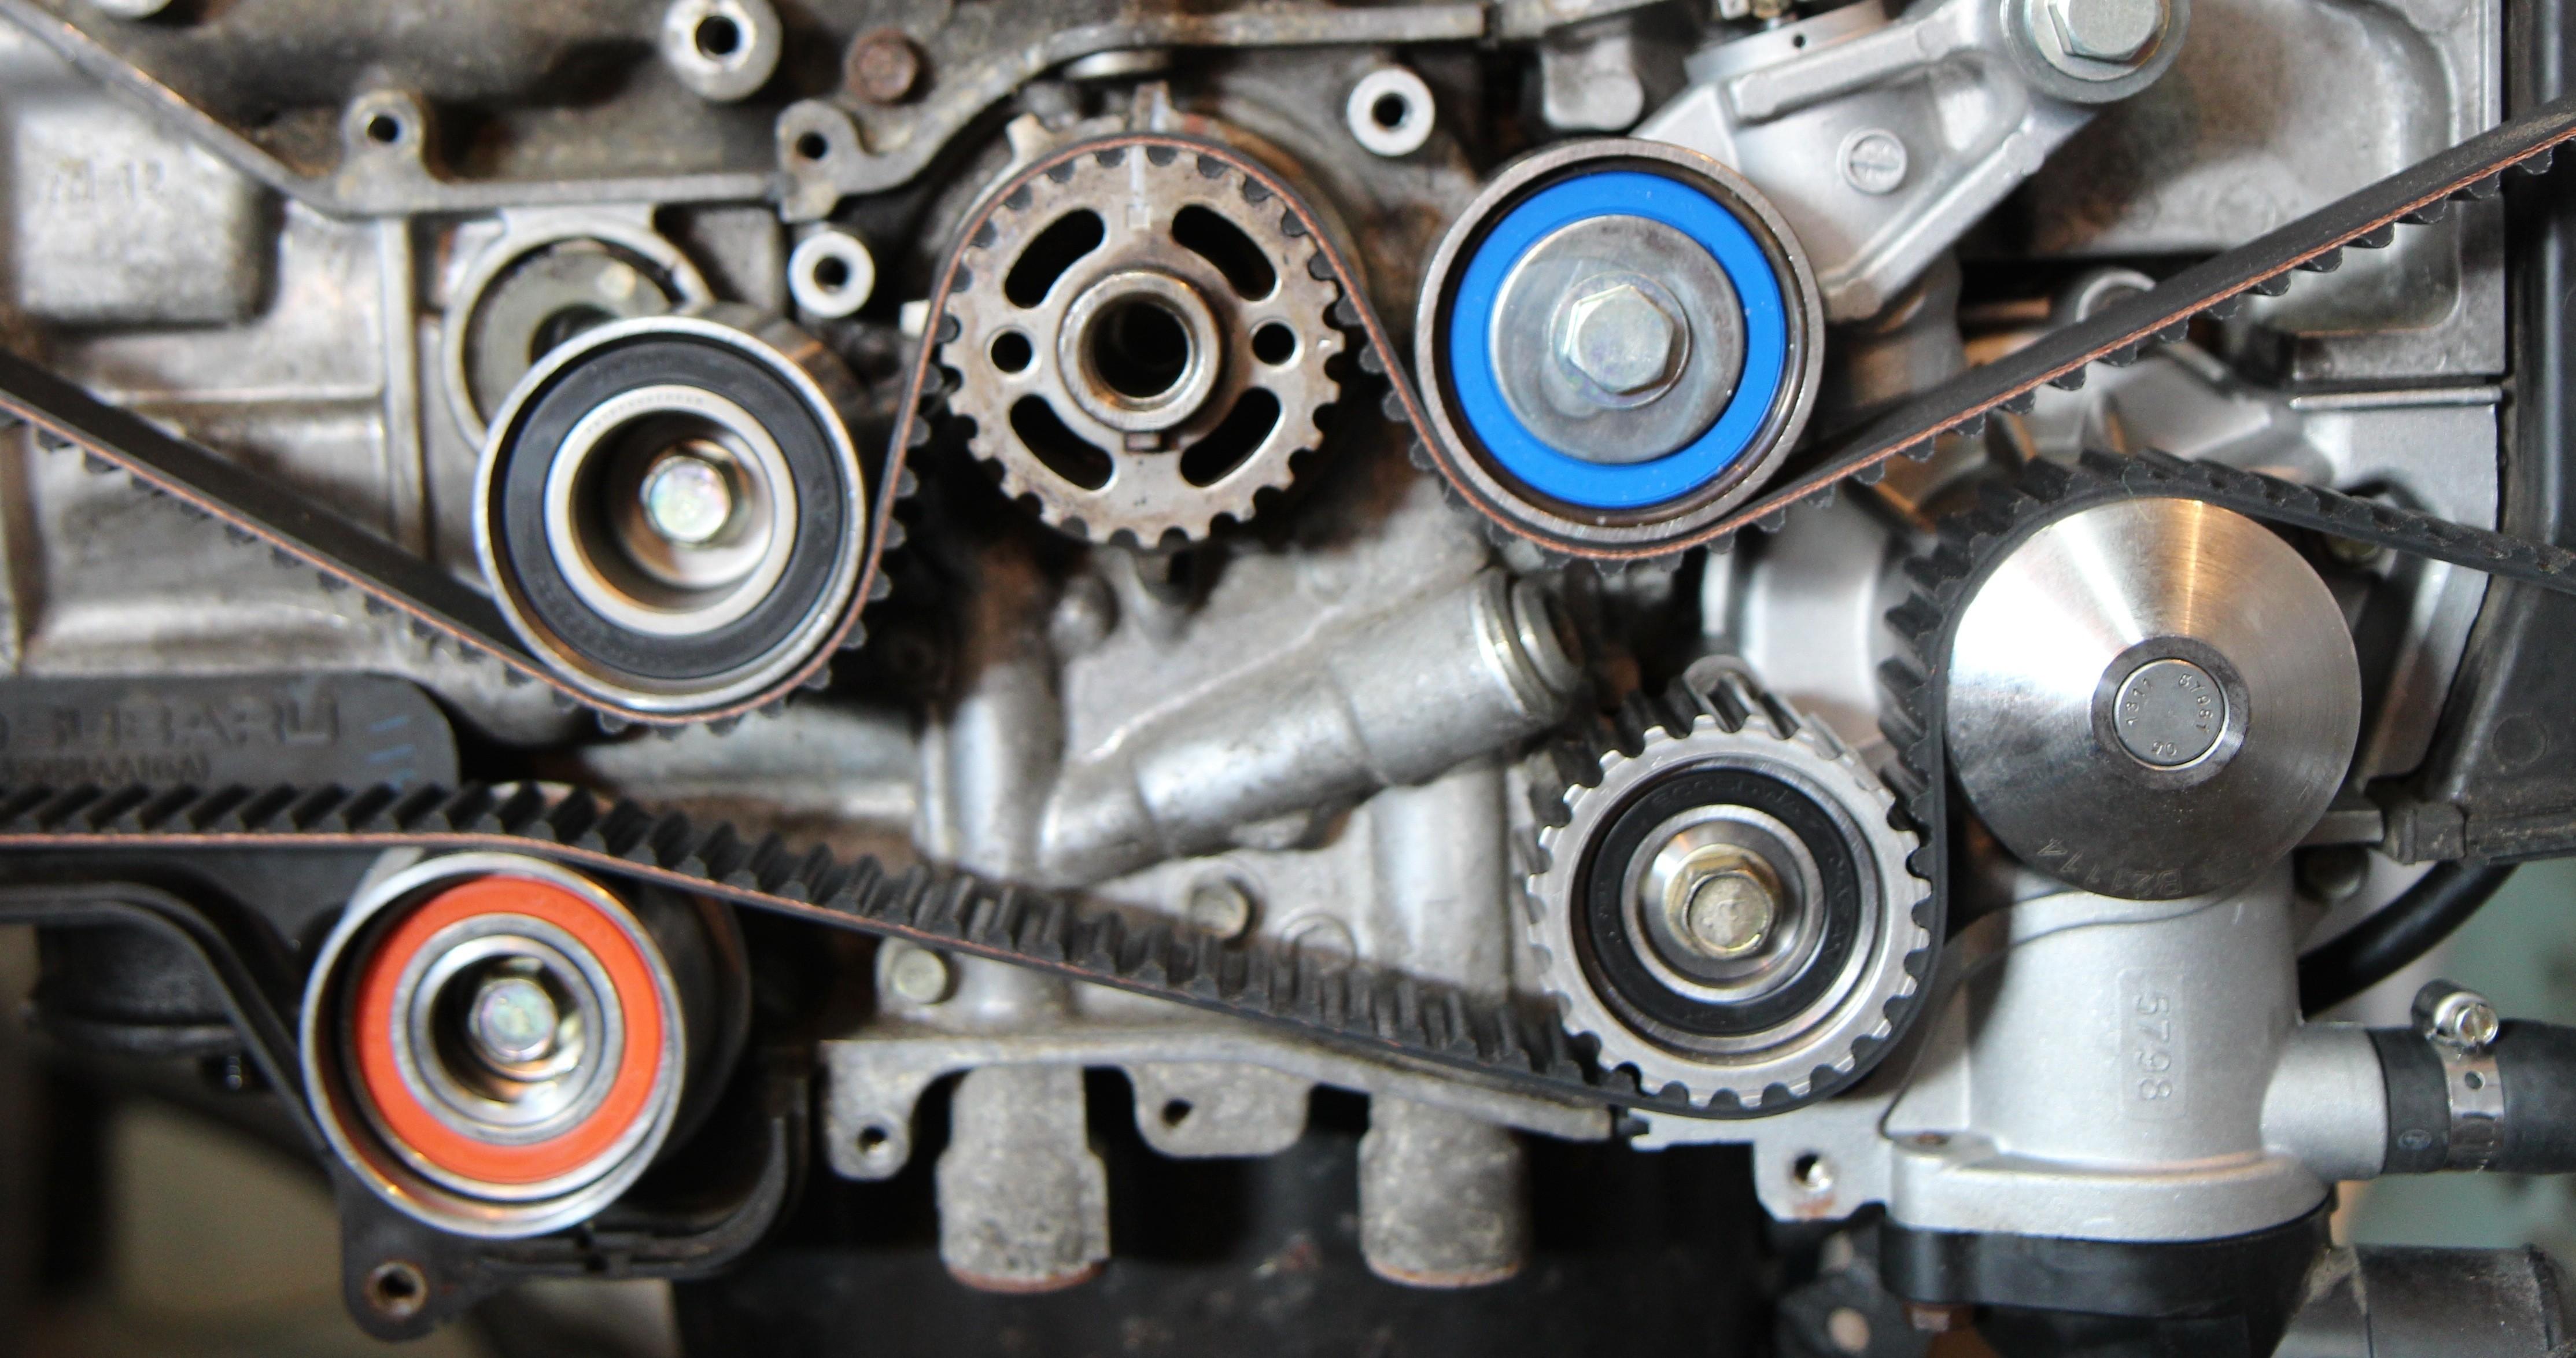 Subaru Sti Engine Diagram Subaru 2 5 Engine Diagram How to Set Timing Timing Belt Change A Of Subaru Sti Engine Diagram